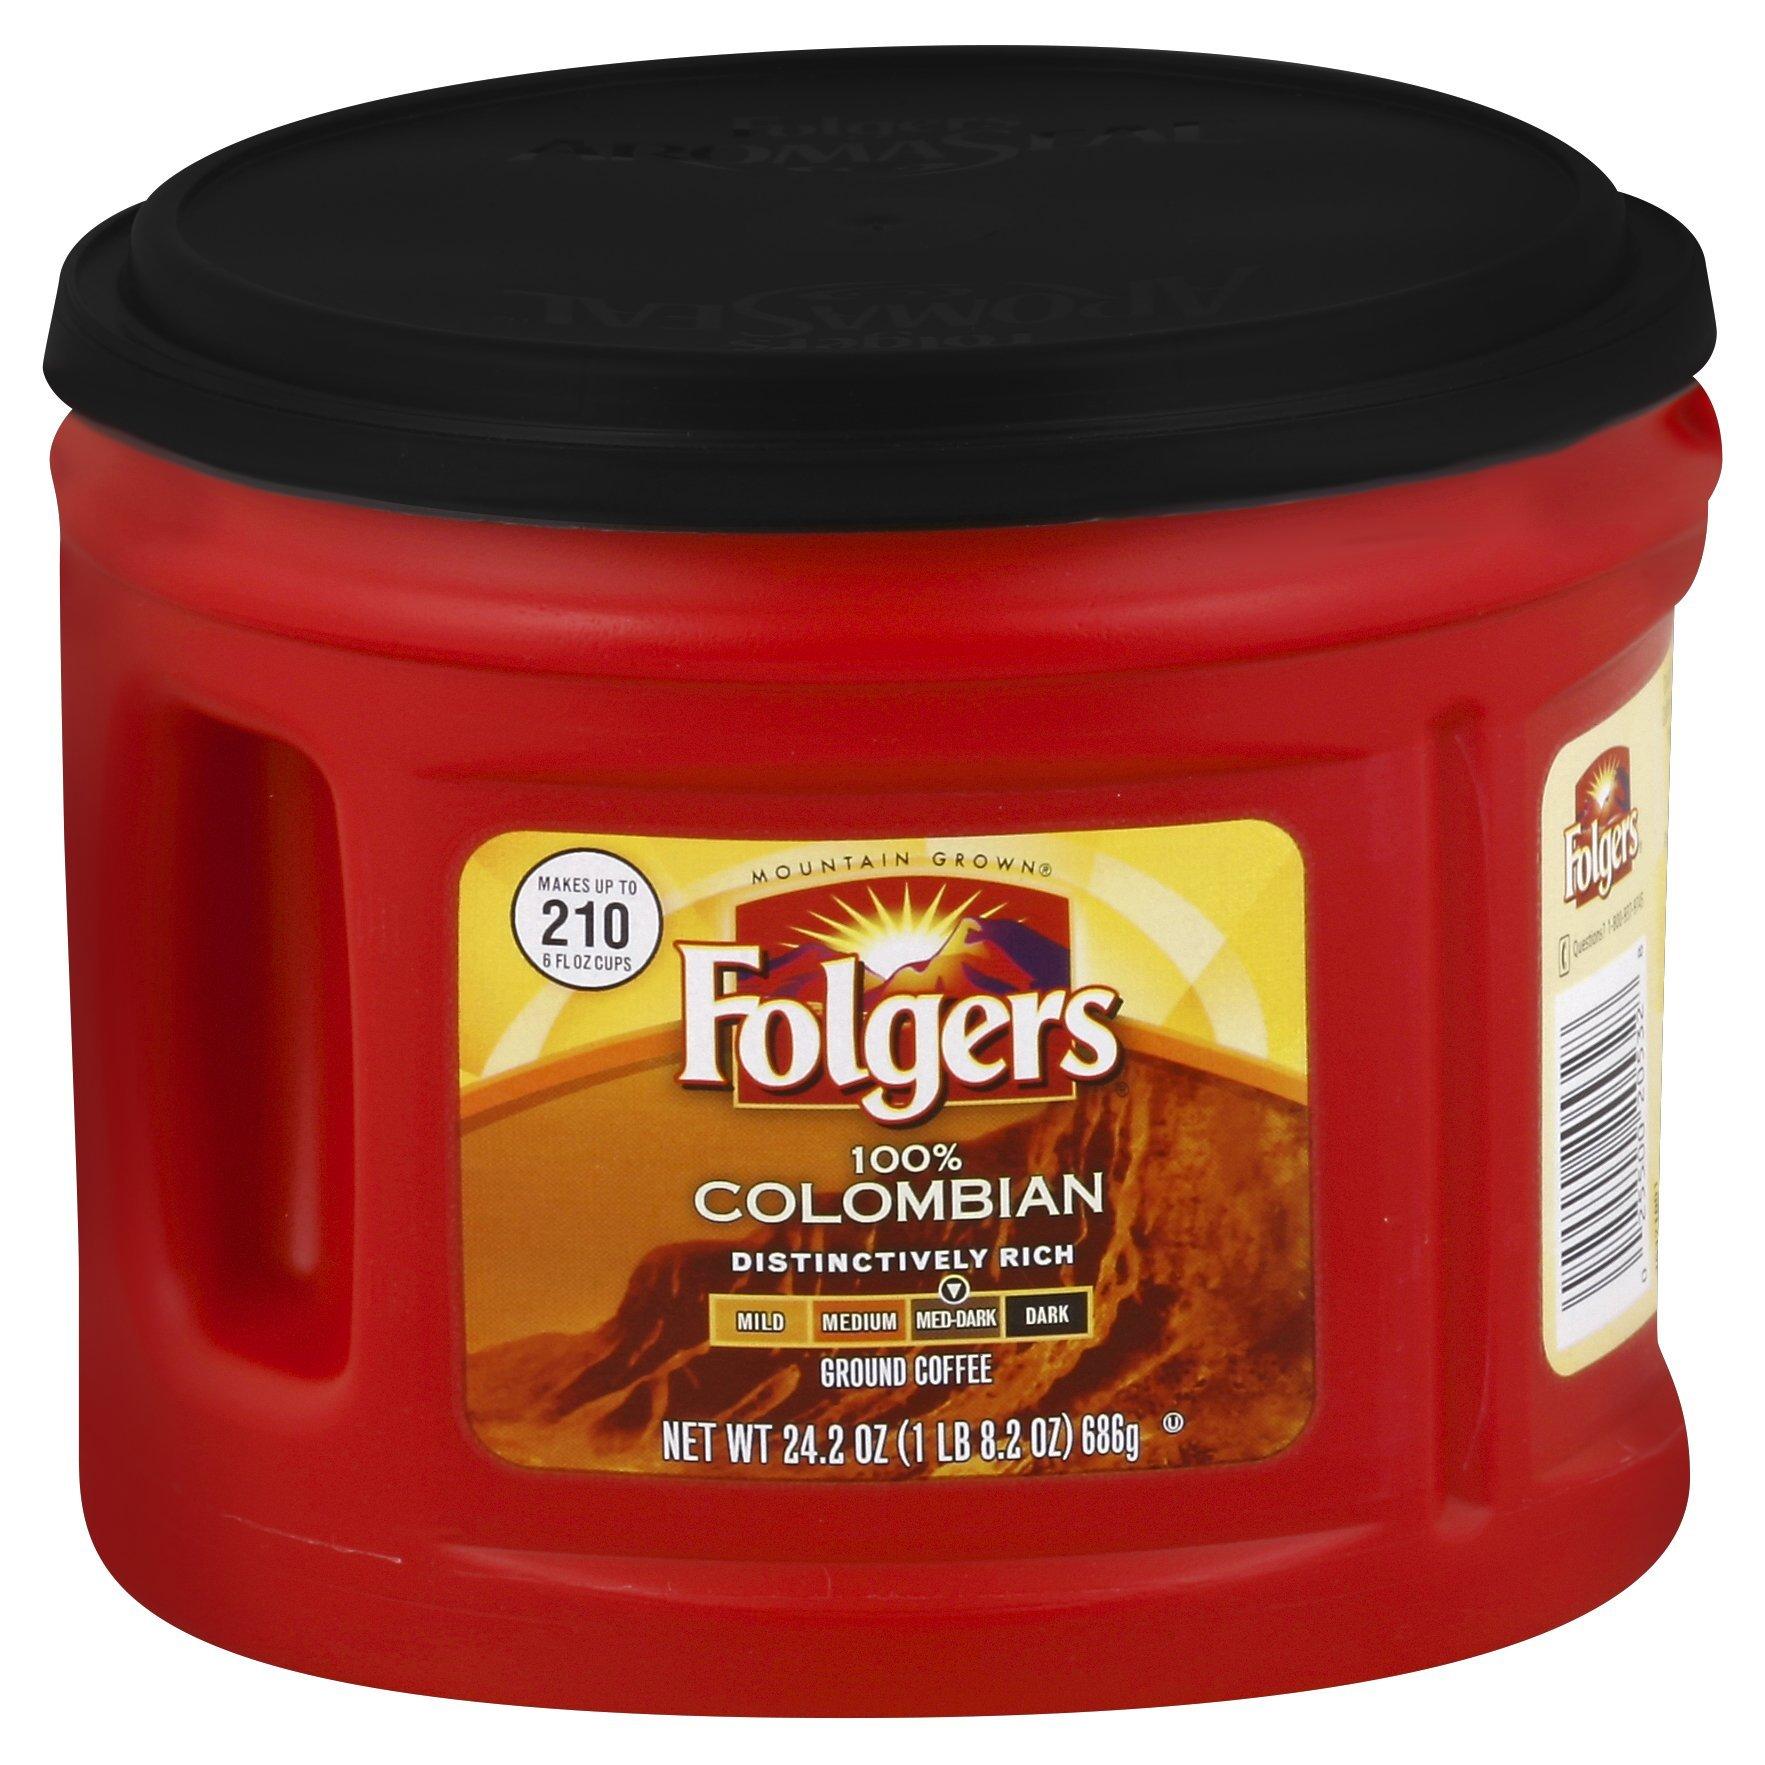 Folgers 100% Colombian Ground Coffee, Medium-Dark Roast, 24.2-Ounce, 6 Count